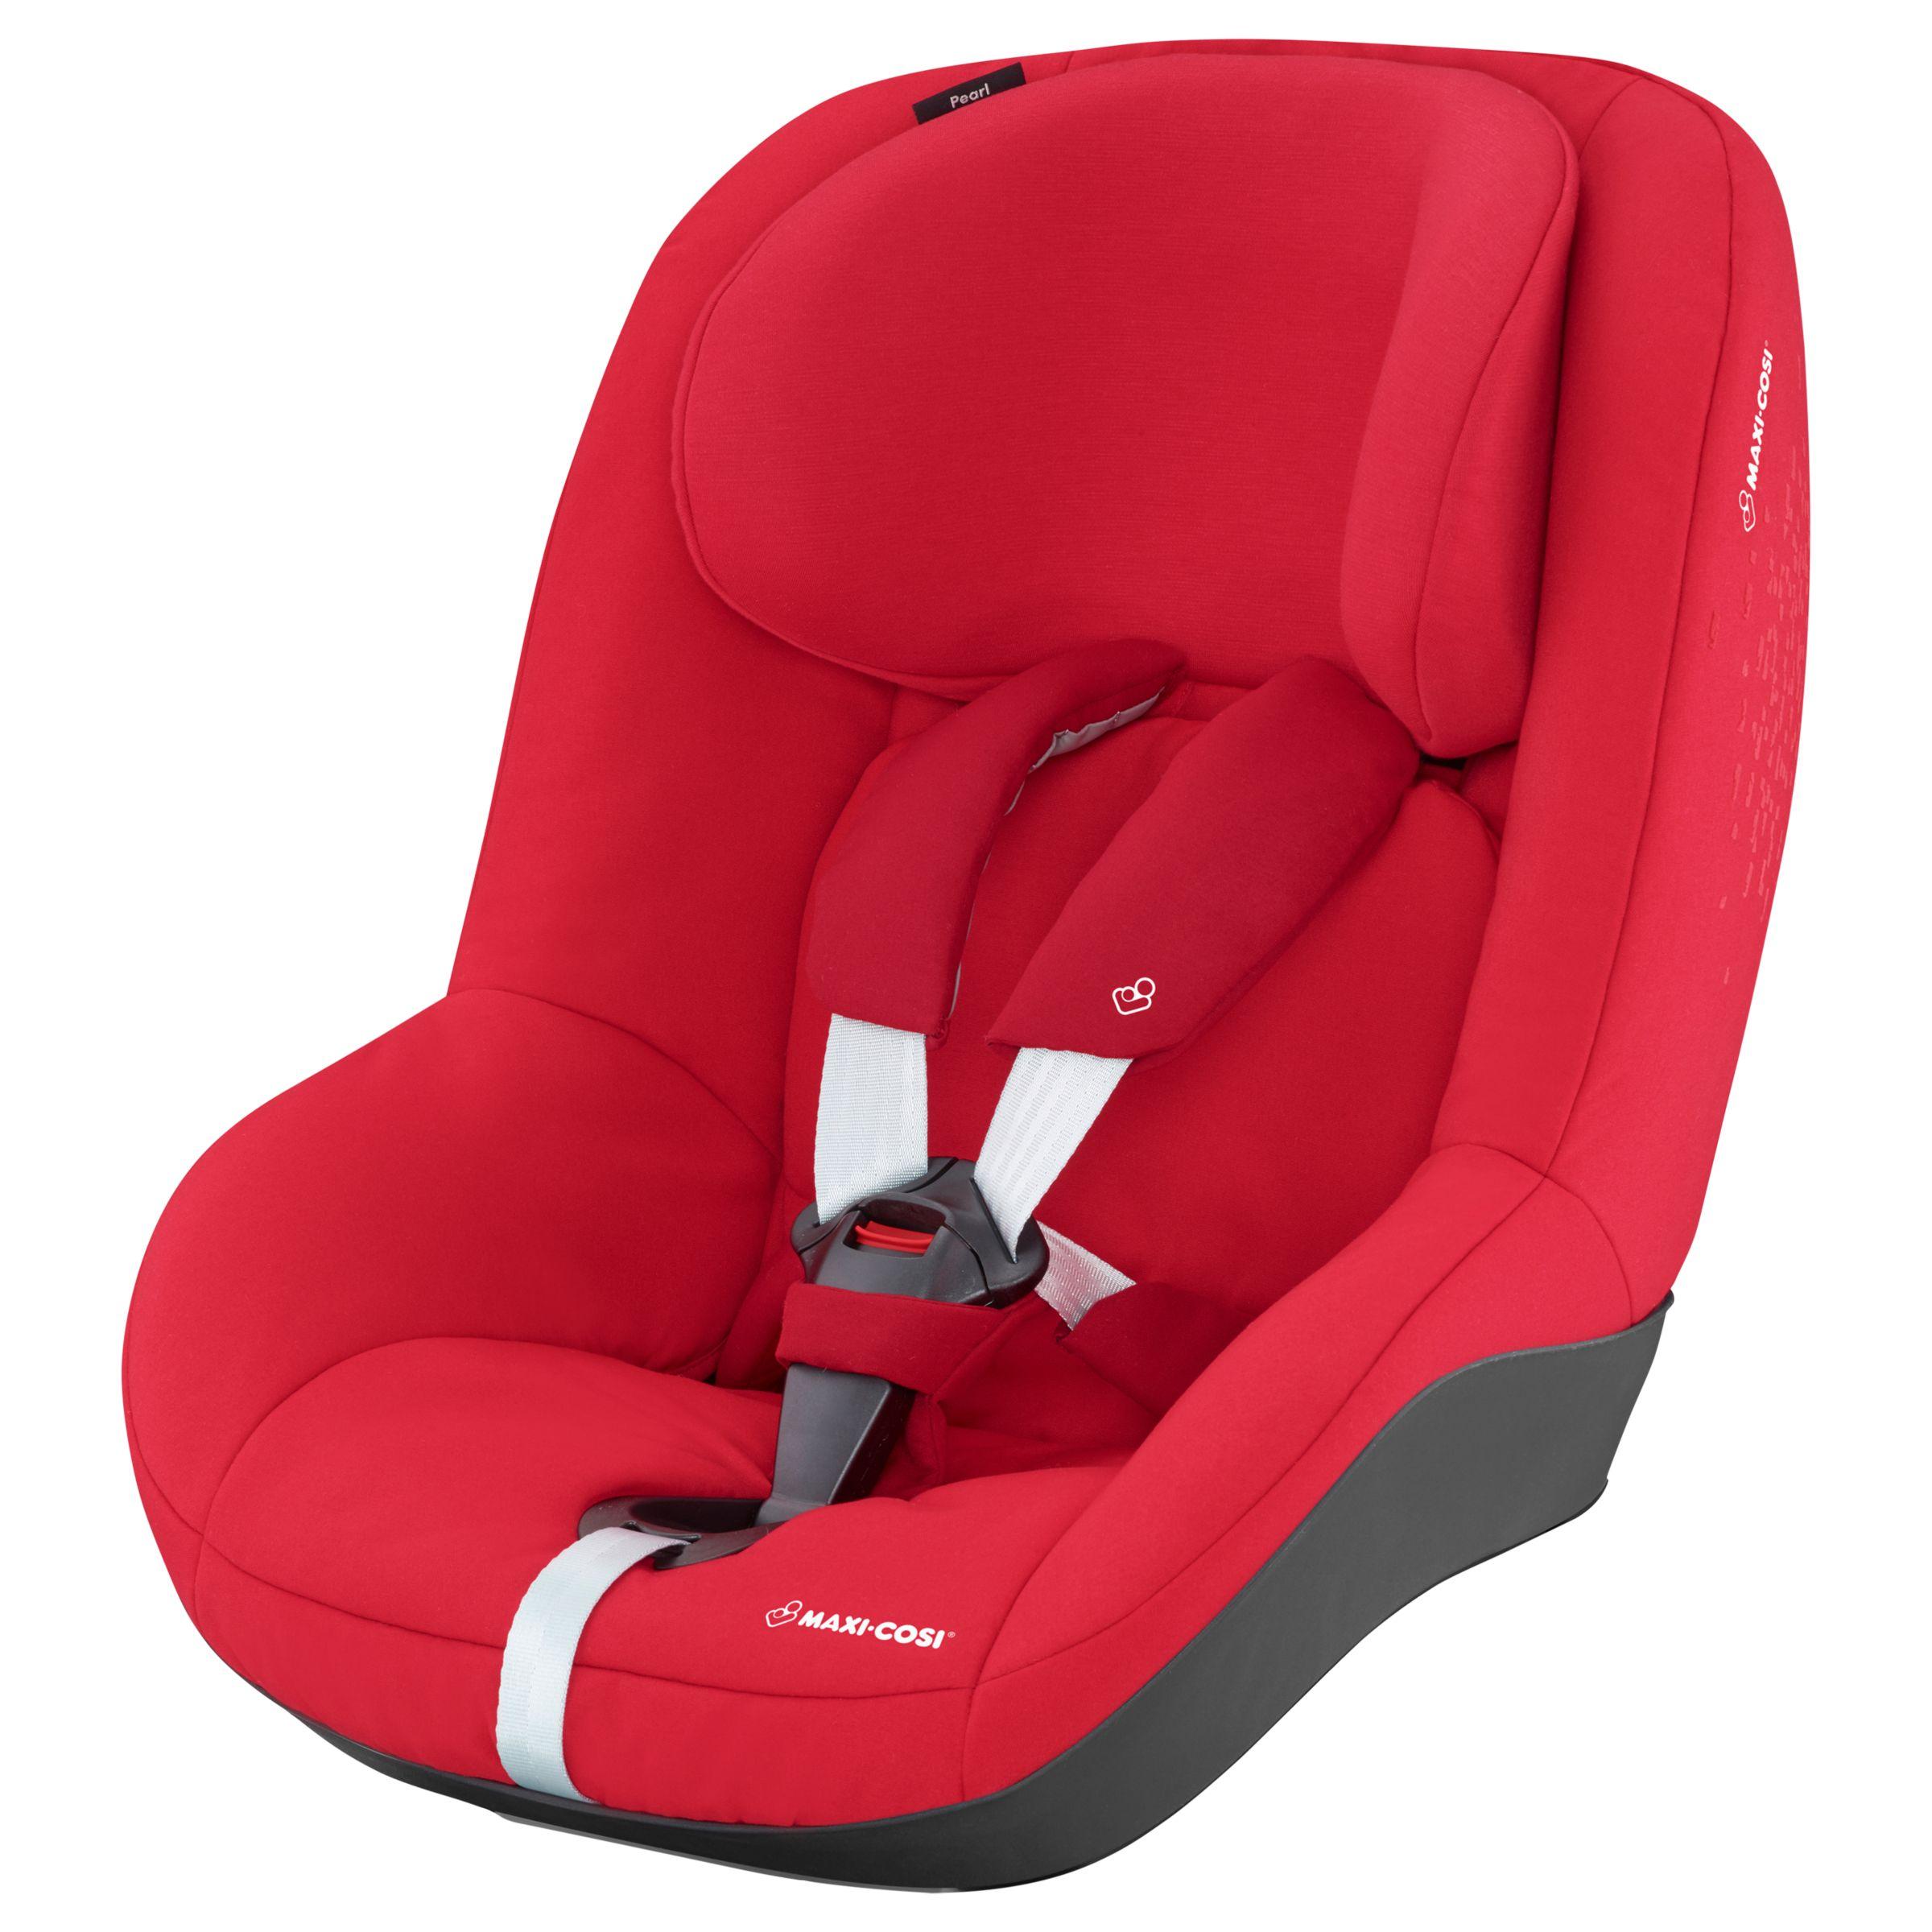 maxi cosi familyfix base group 0 1 car seat base at john. Black Bedroom Furniture Sets. Home Design Ideas